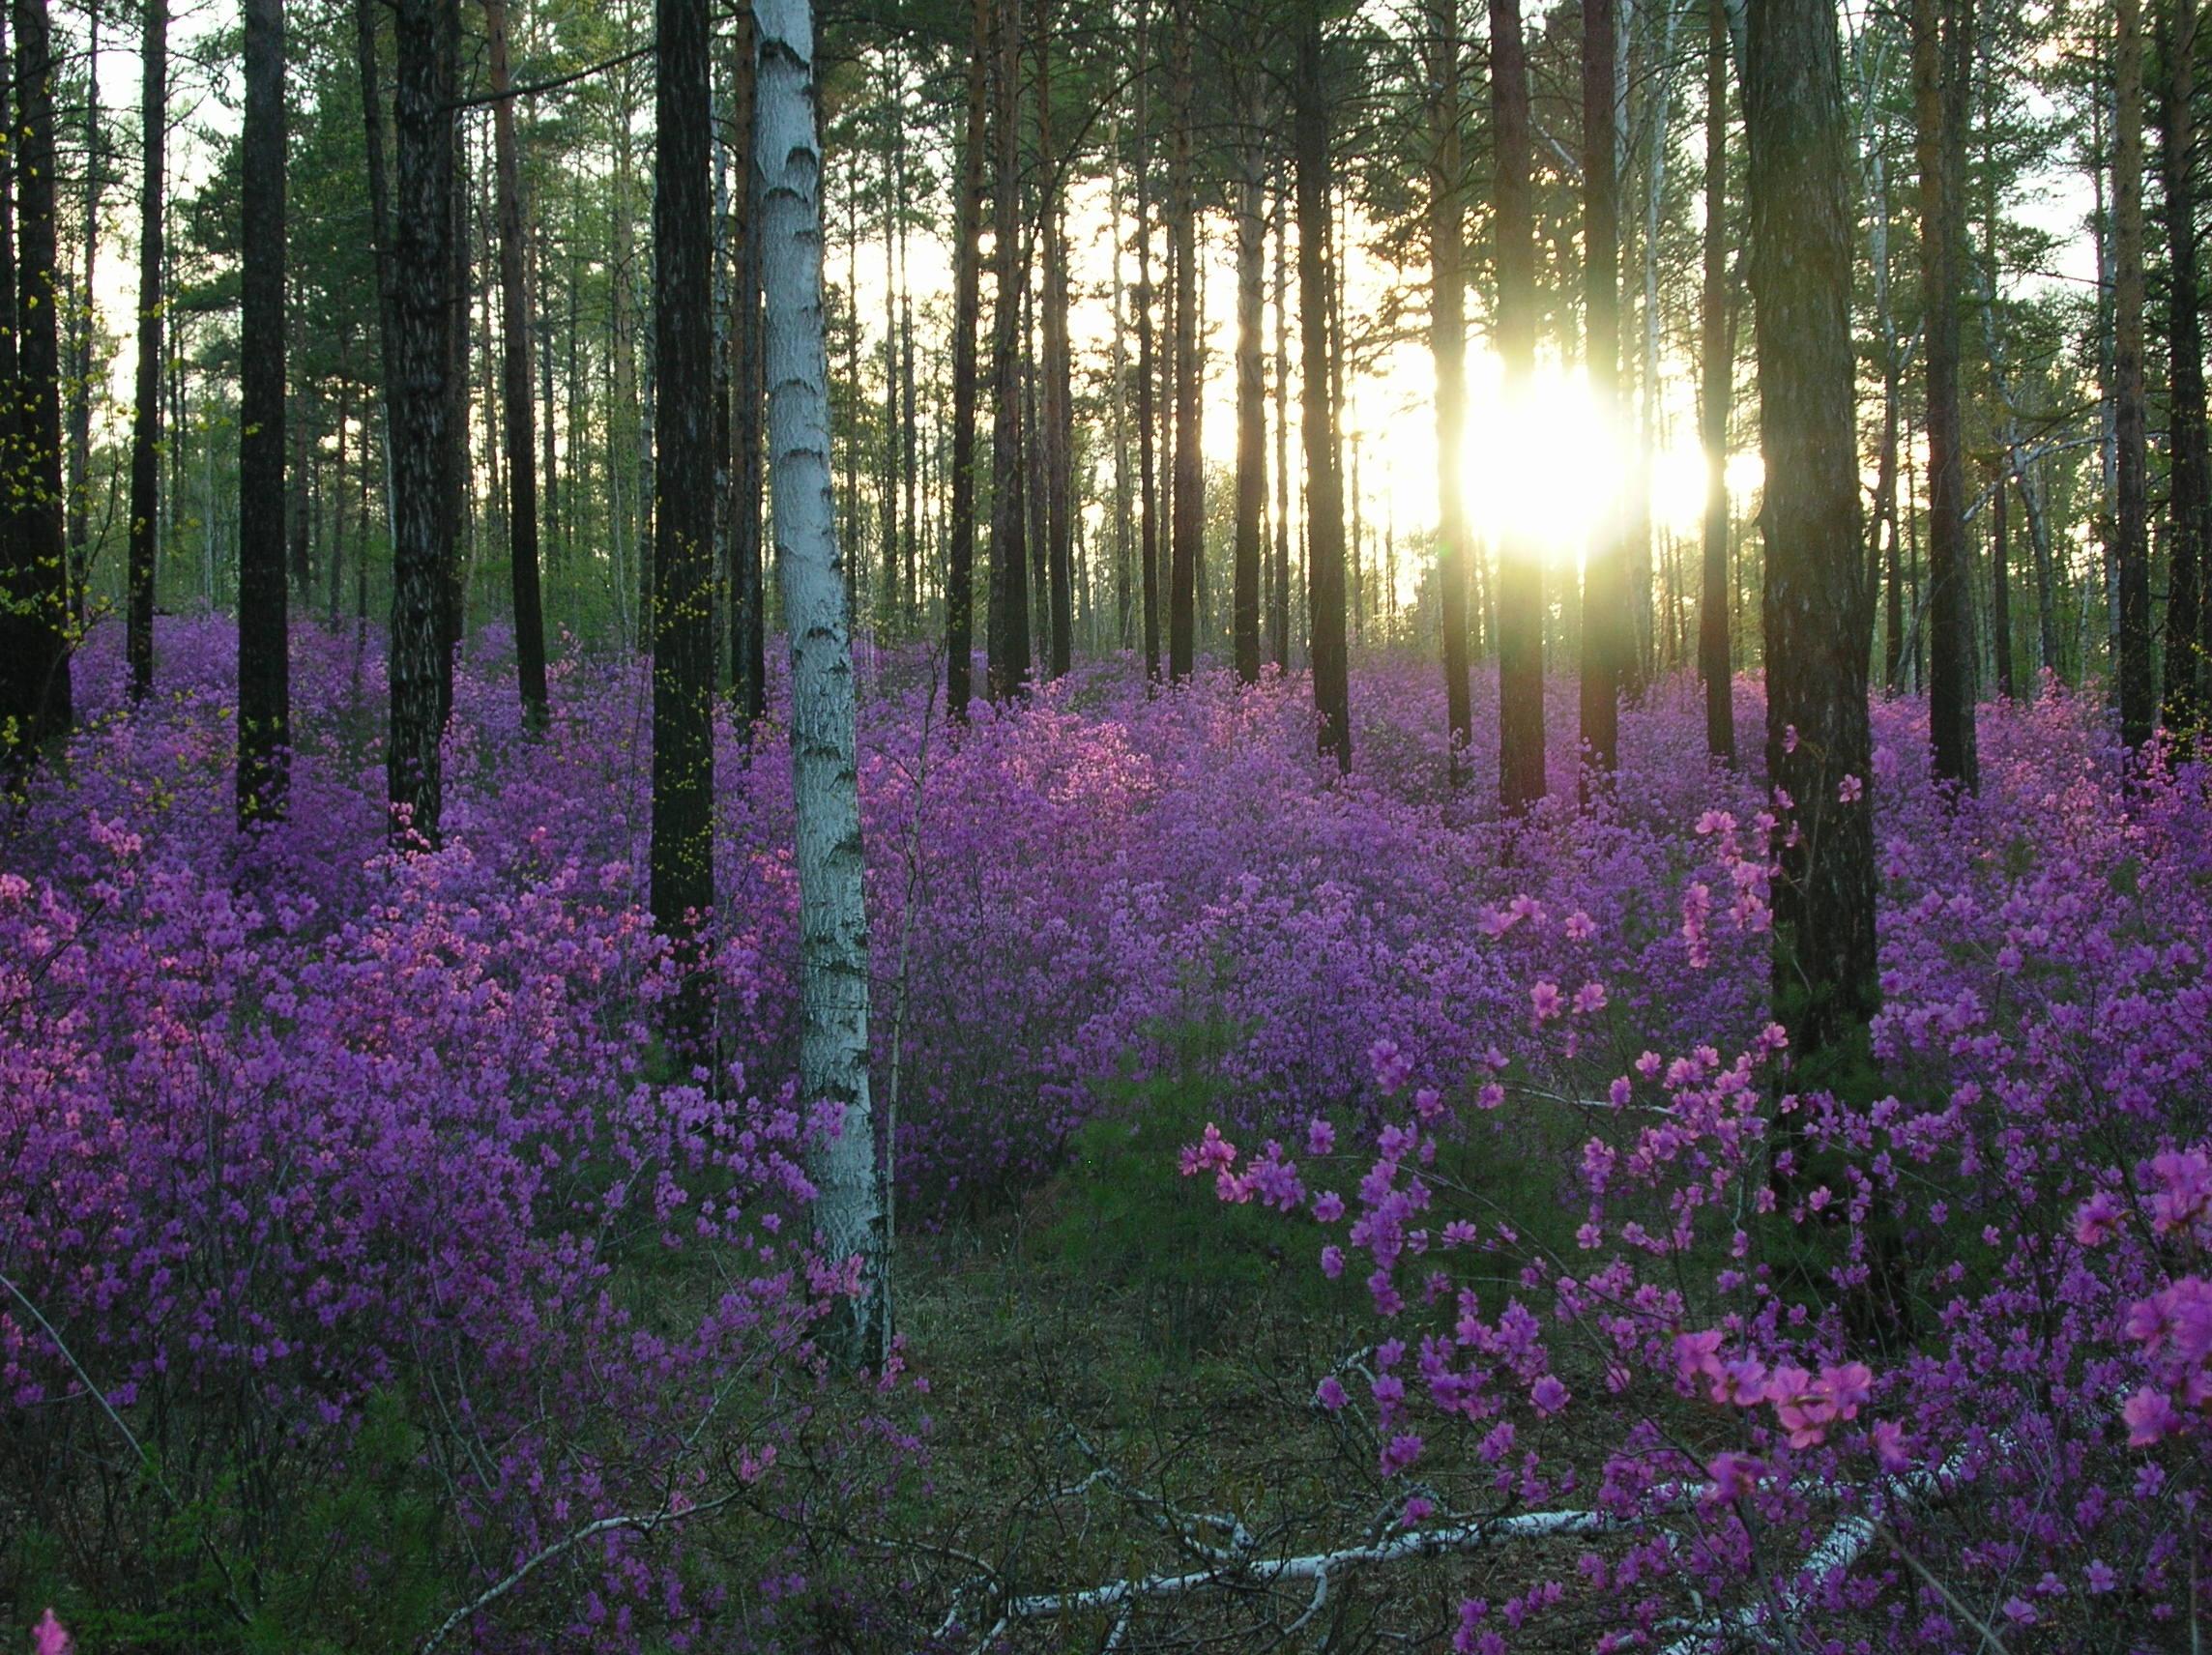 Багульник вечер лес фото